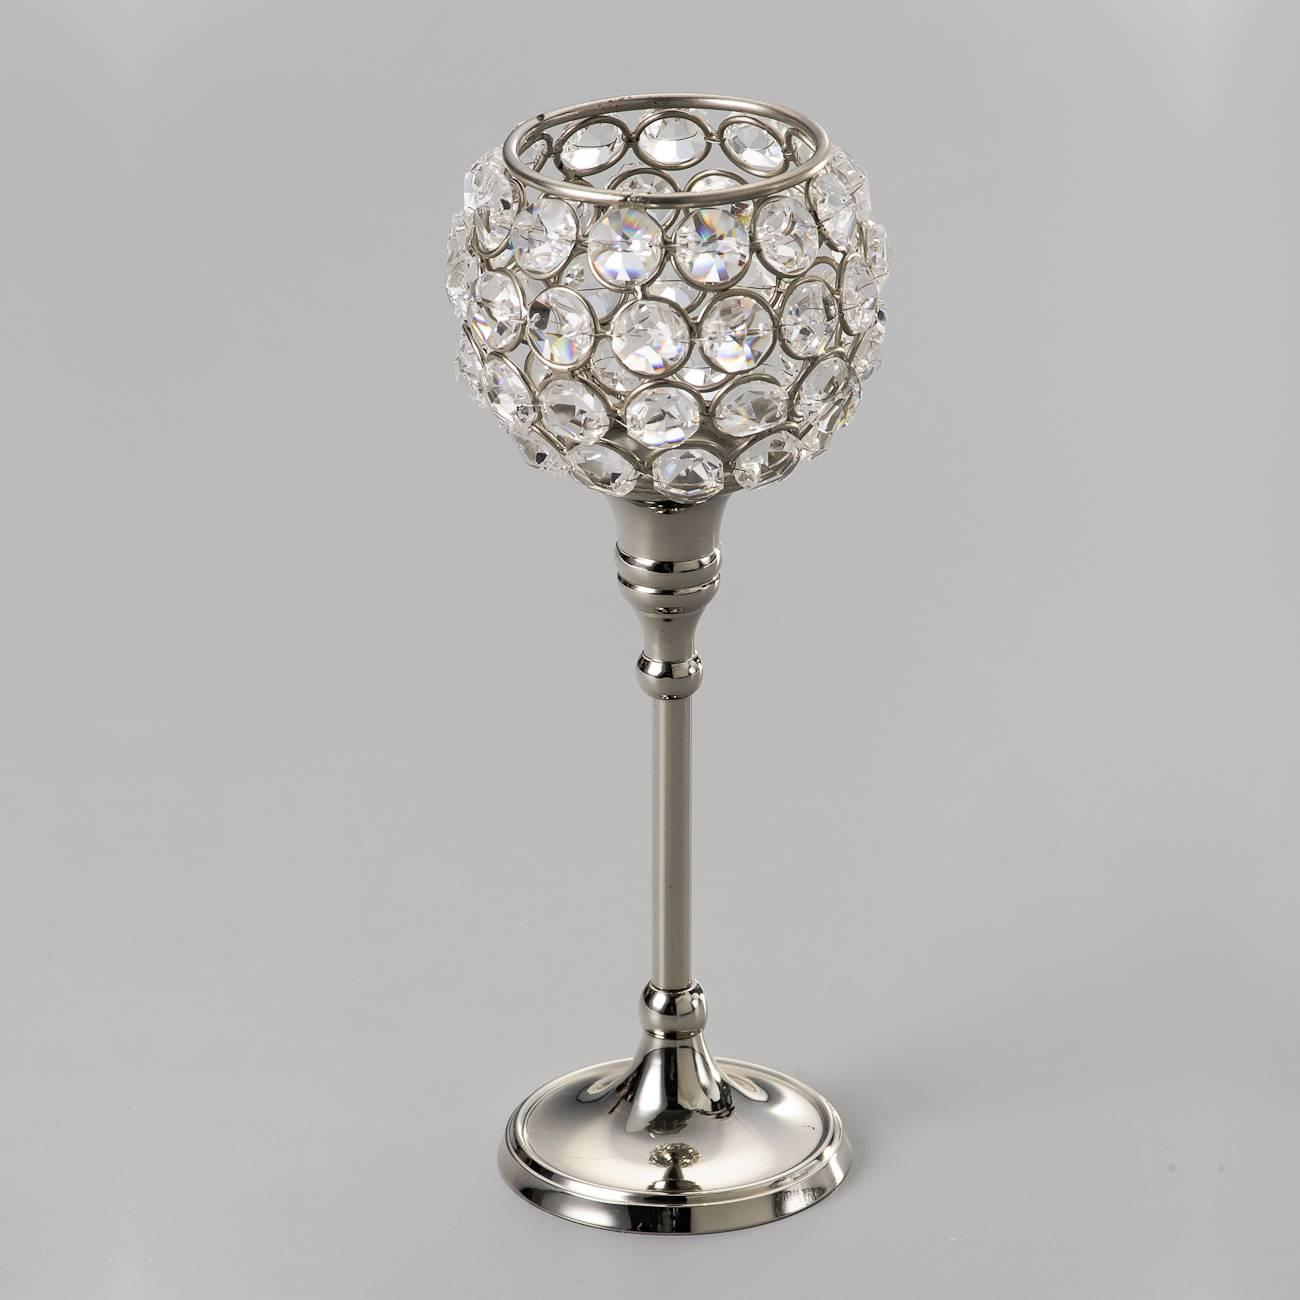 Castiçal Delicate Médio Prateado em Cristal e Ferro - Delhi Wolff - 20x5,6 cm